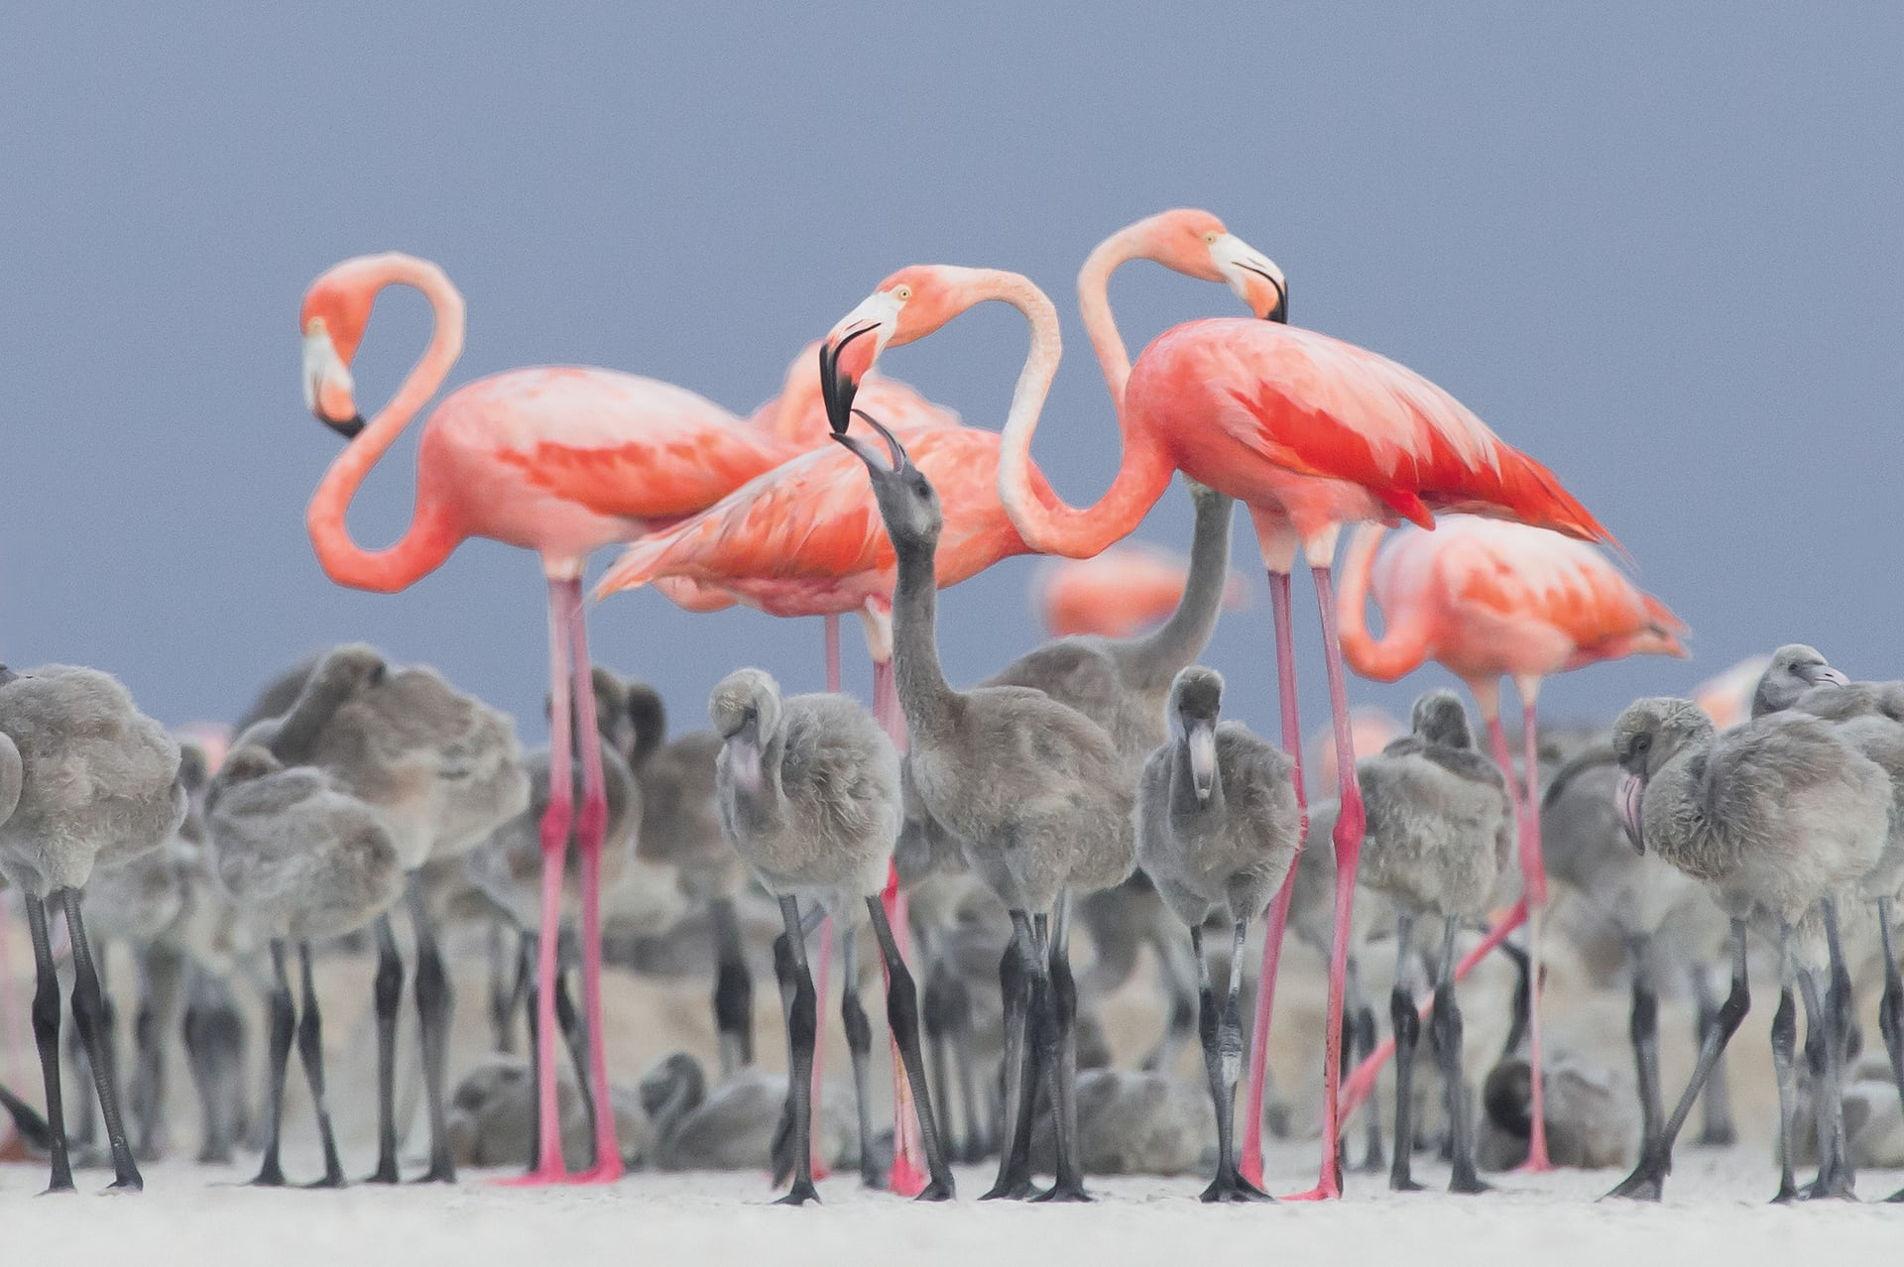 Фотограф, подсматривающий за фламинго, победил в международном конкурсе